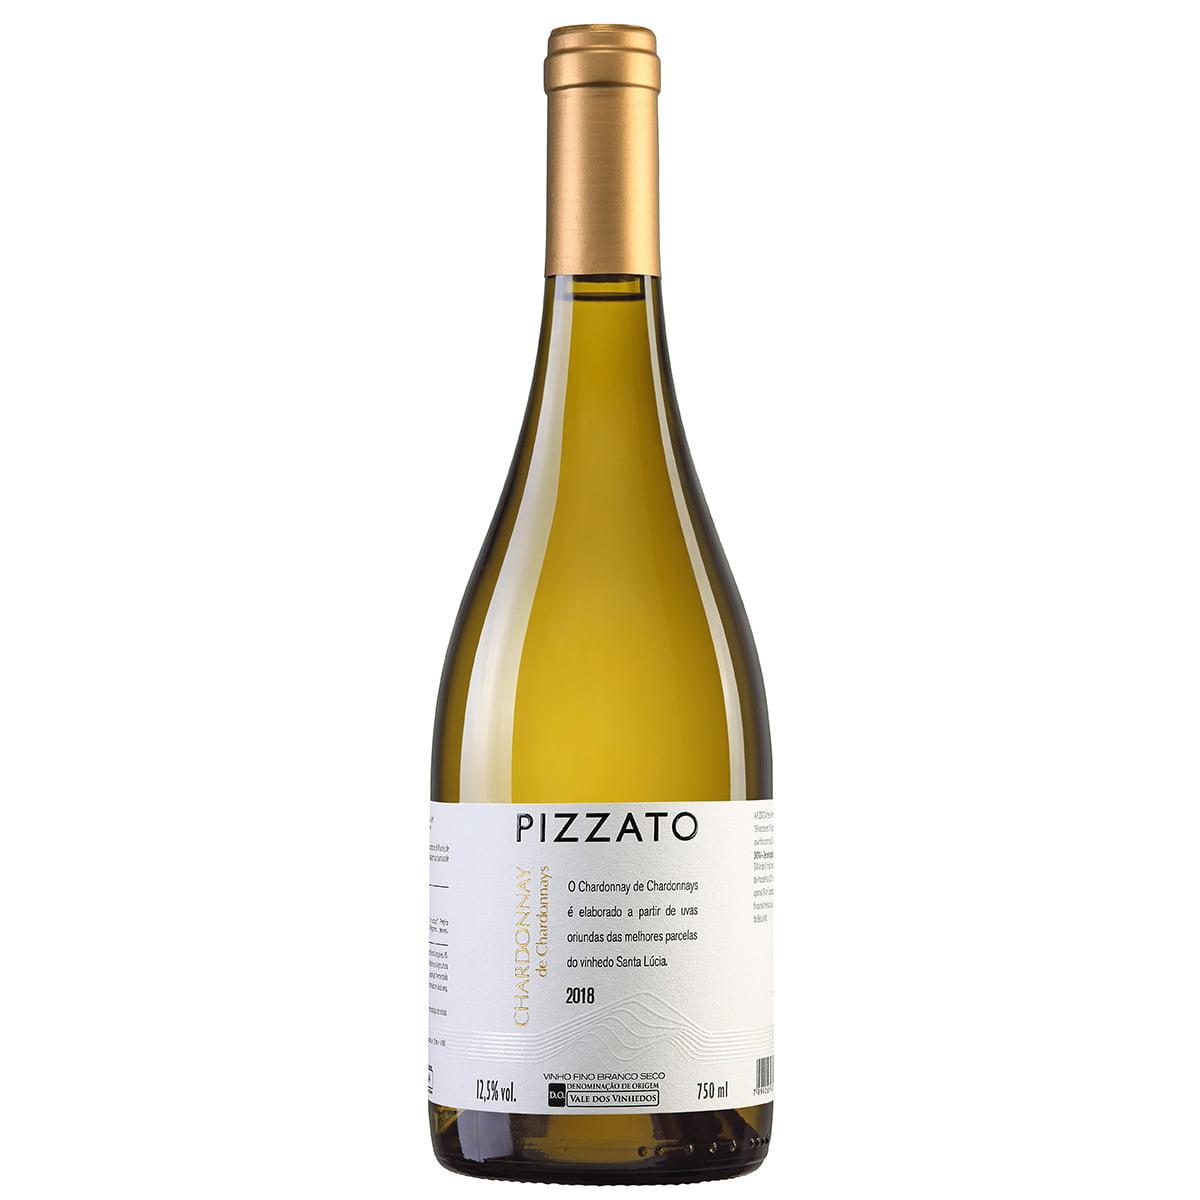 Vinho Pizzato Chardonnay Branco Seco 750ml